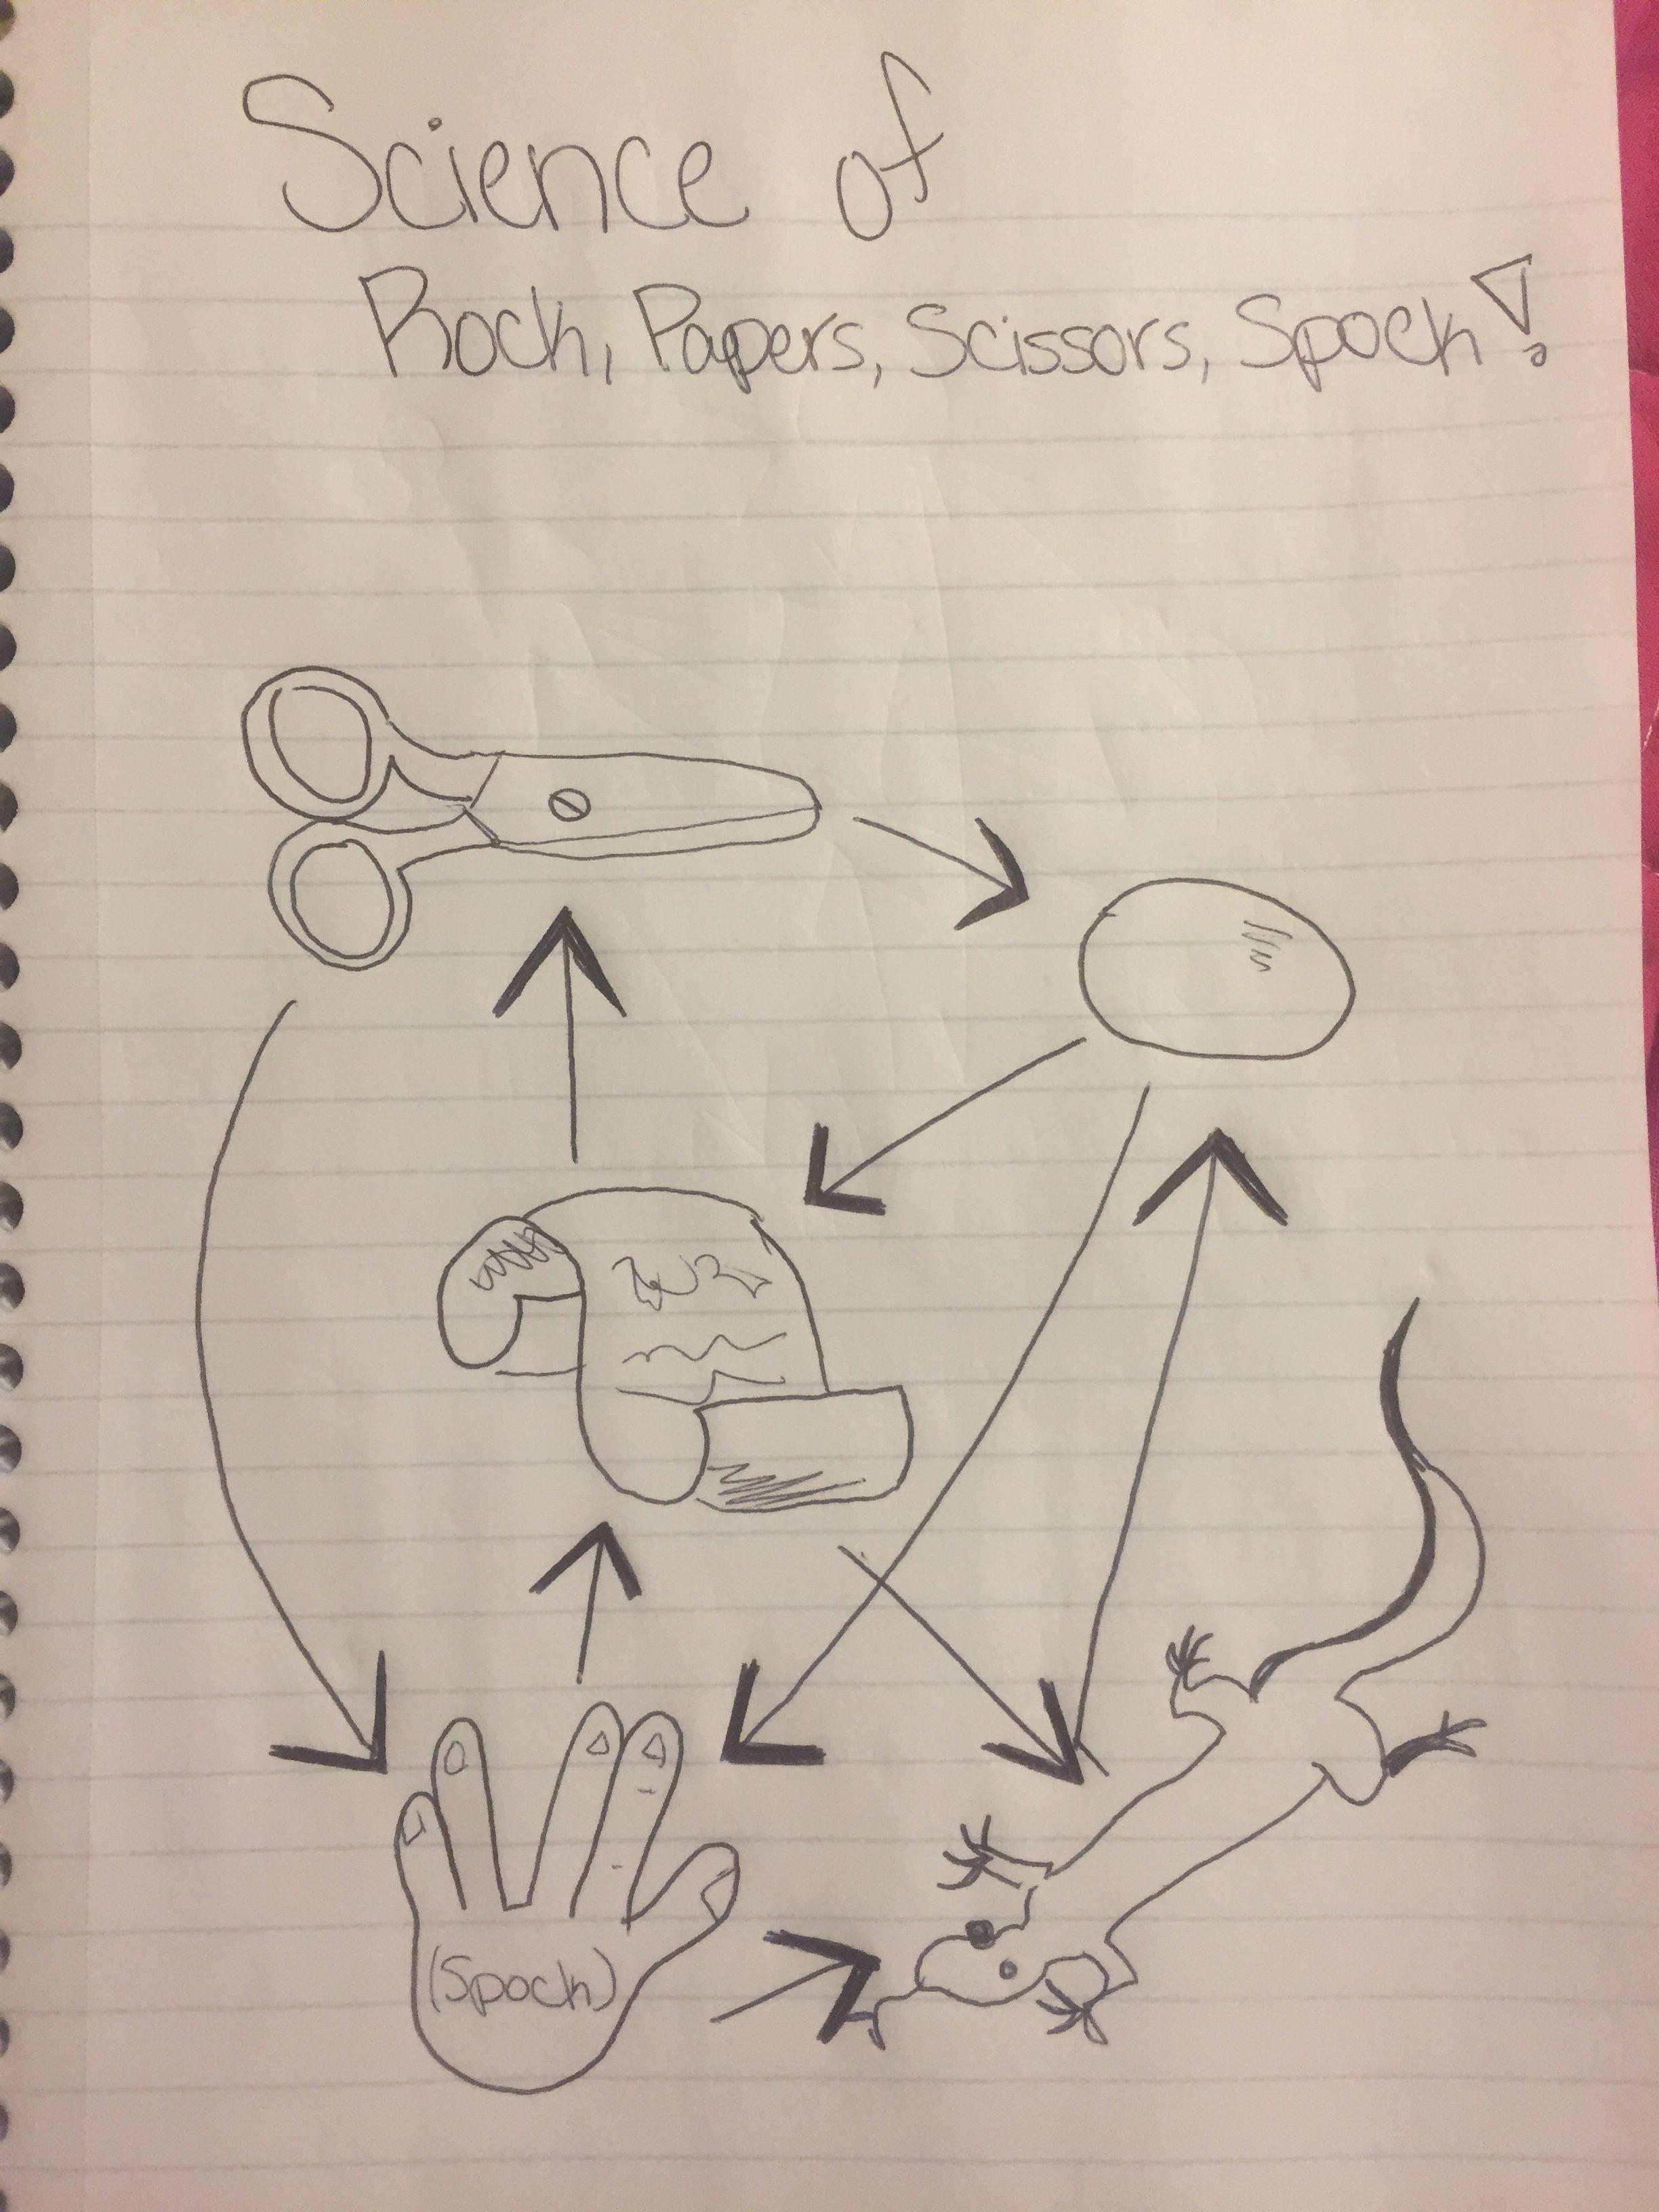 medium resolution of big bang theory rock paper scissors spock lizard in a science diagram